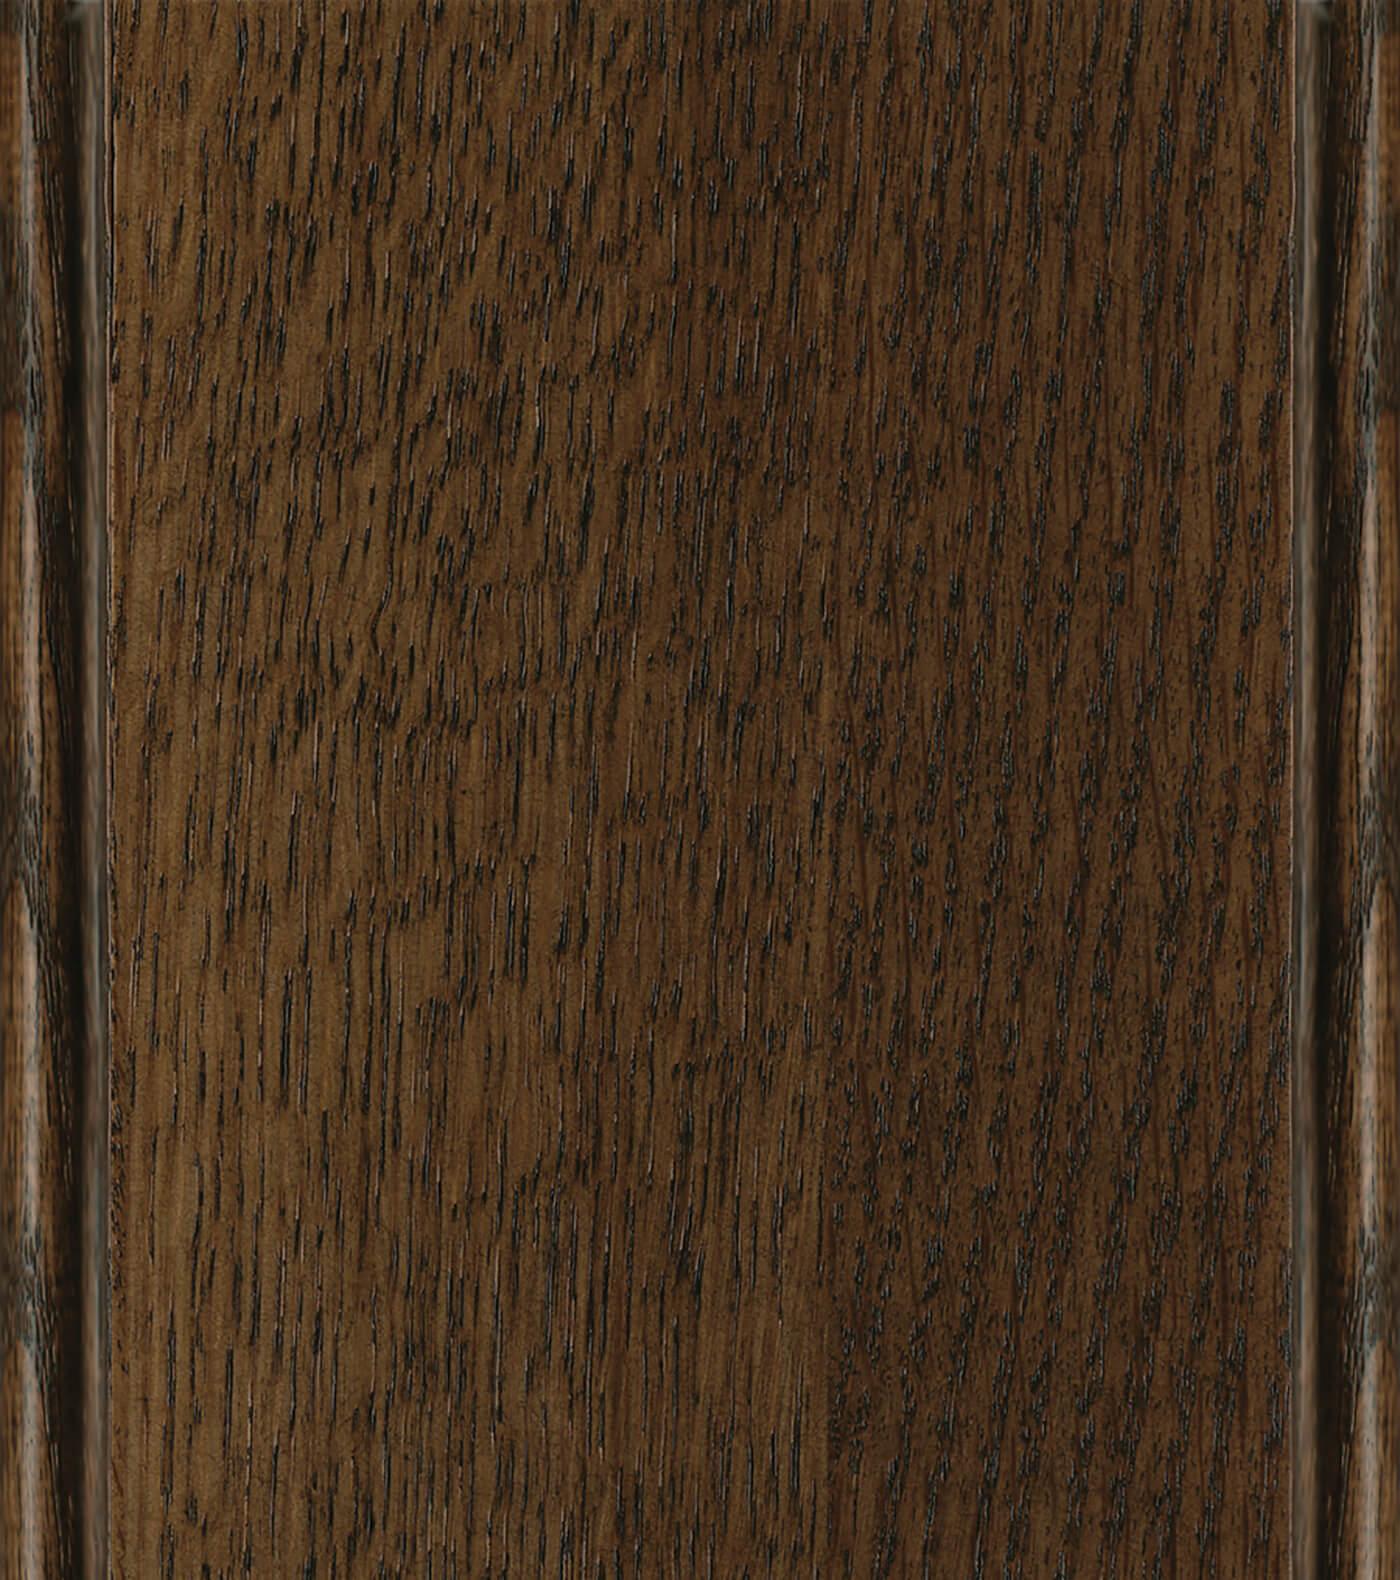 Praline Stain on Red Oak or Quarter-Sawn Red Oak